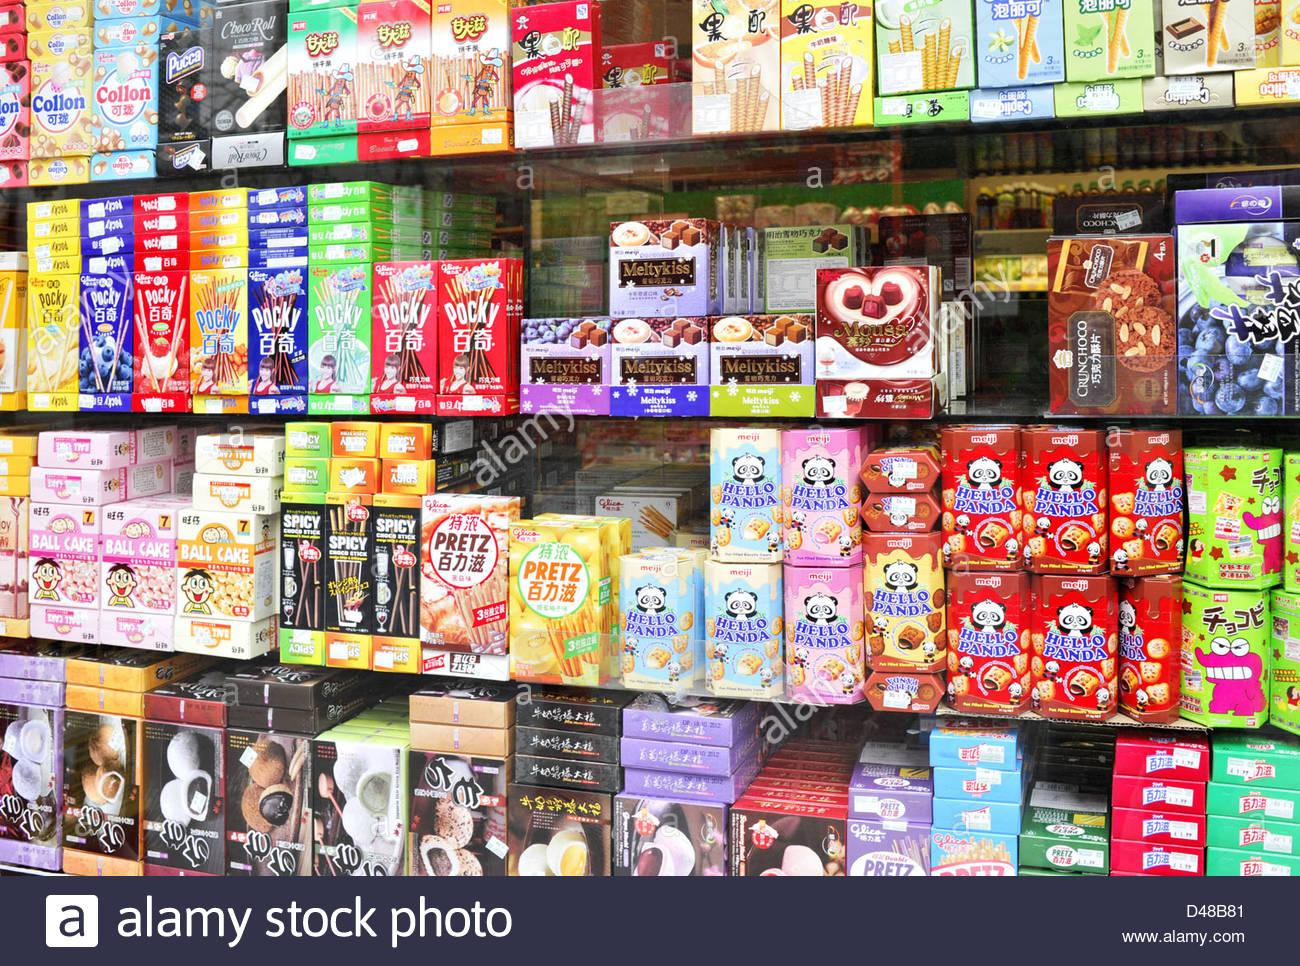 Sweets Supermarket Stock Photos Amp Sweets Supermarket Stock